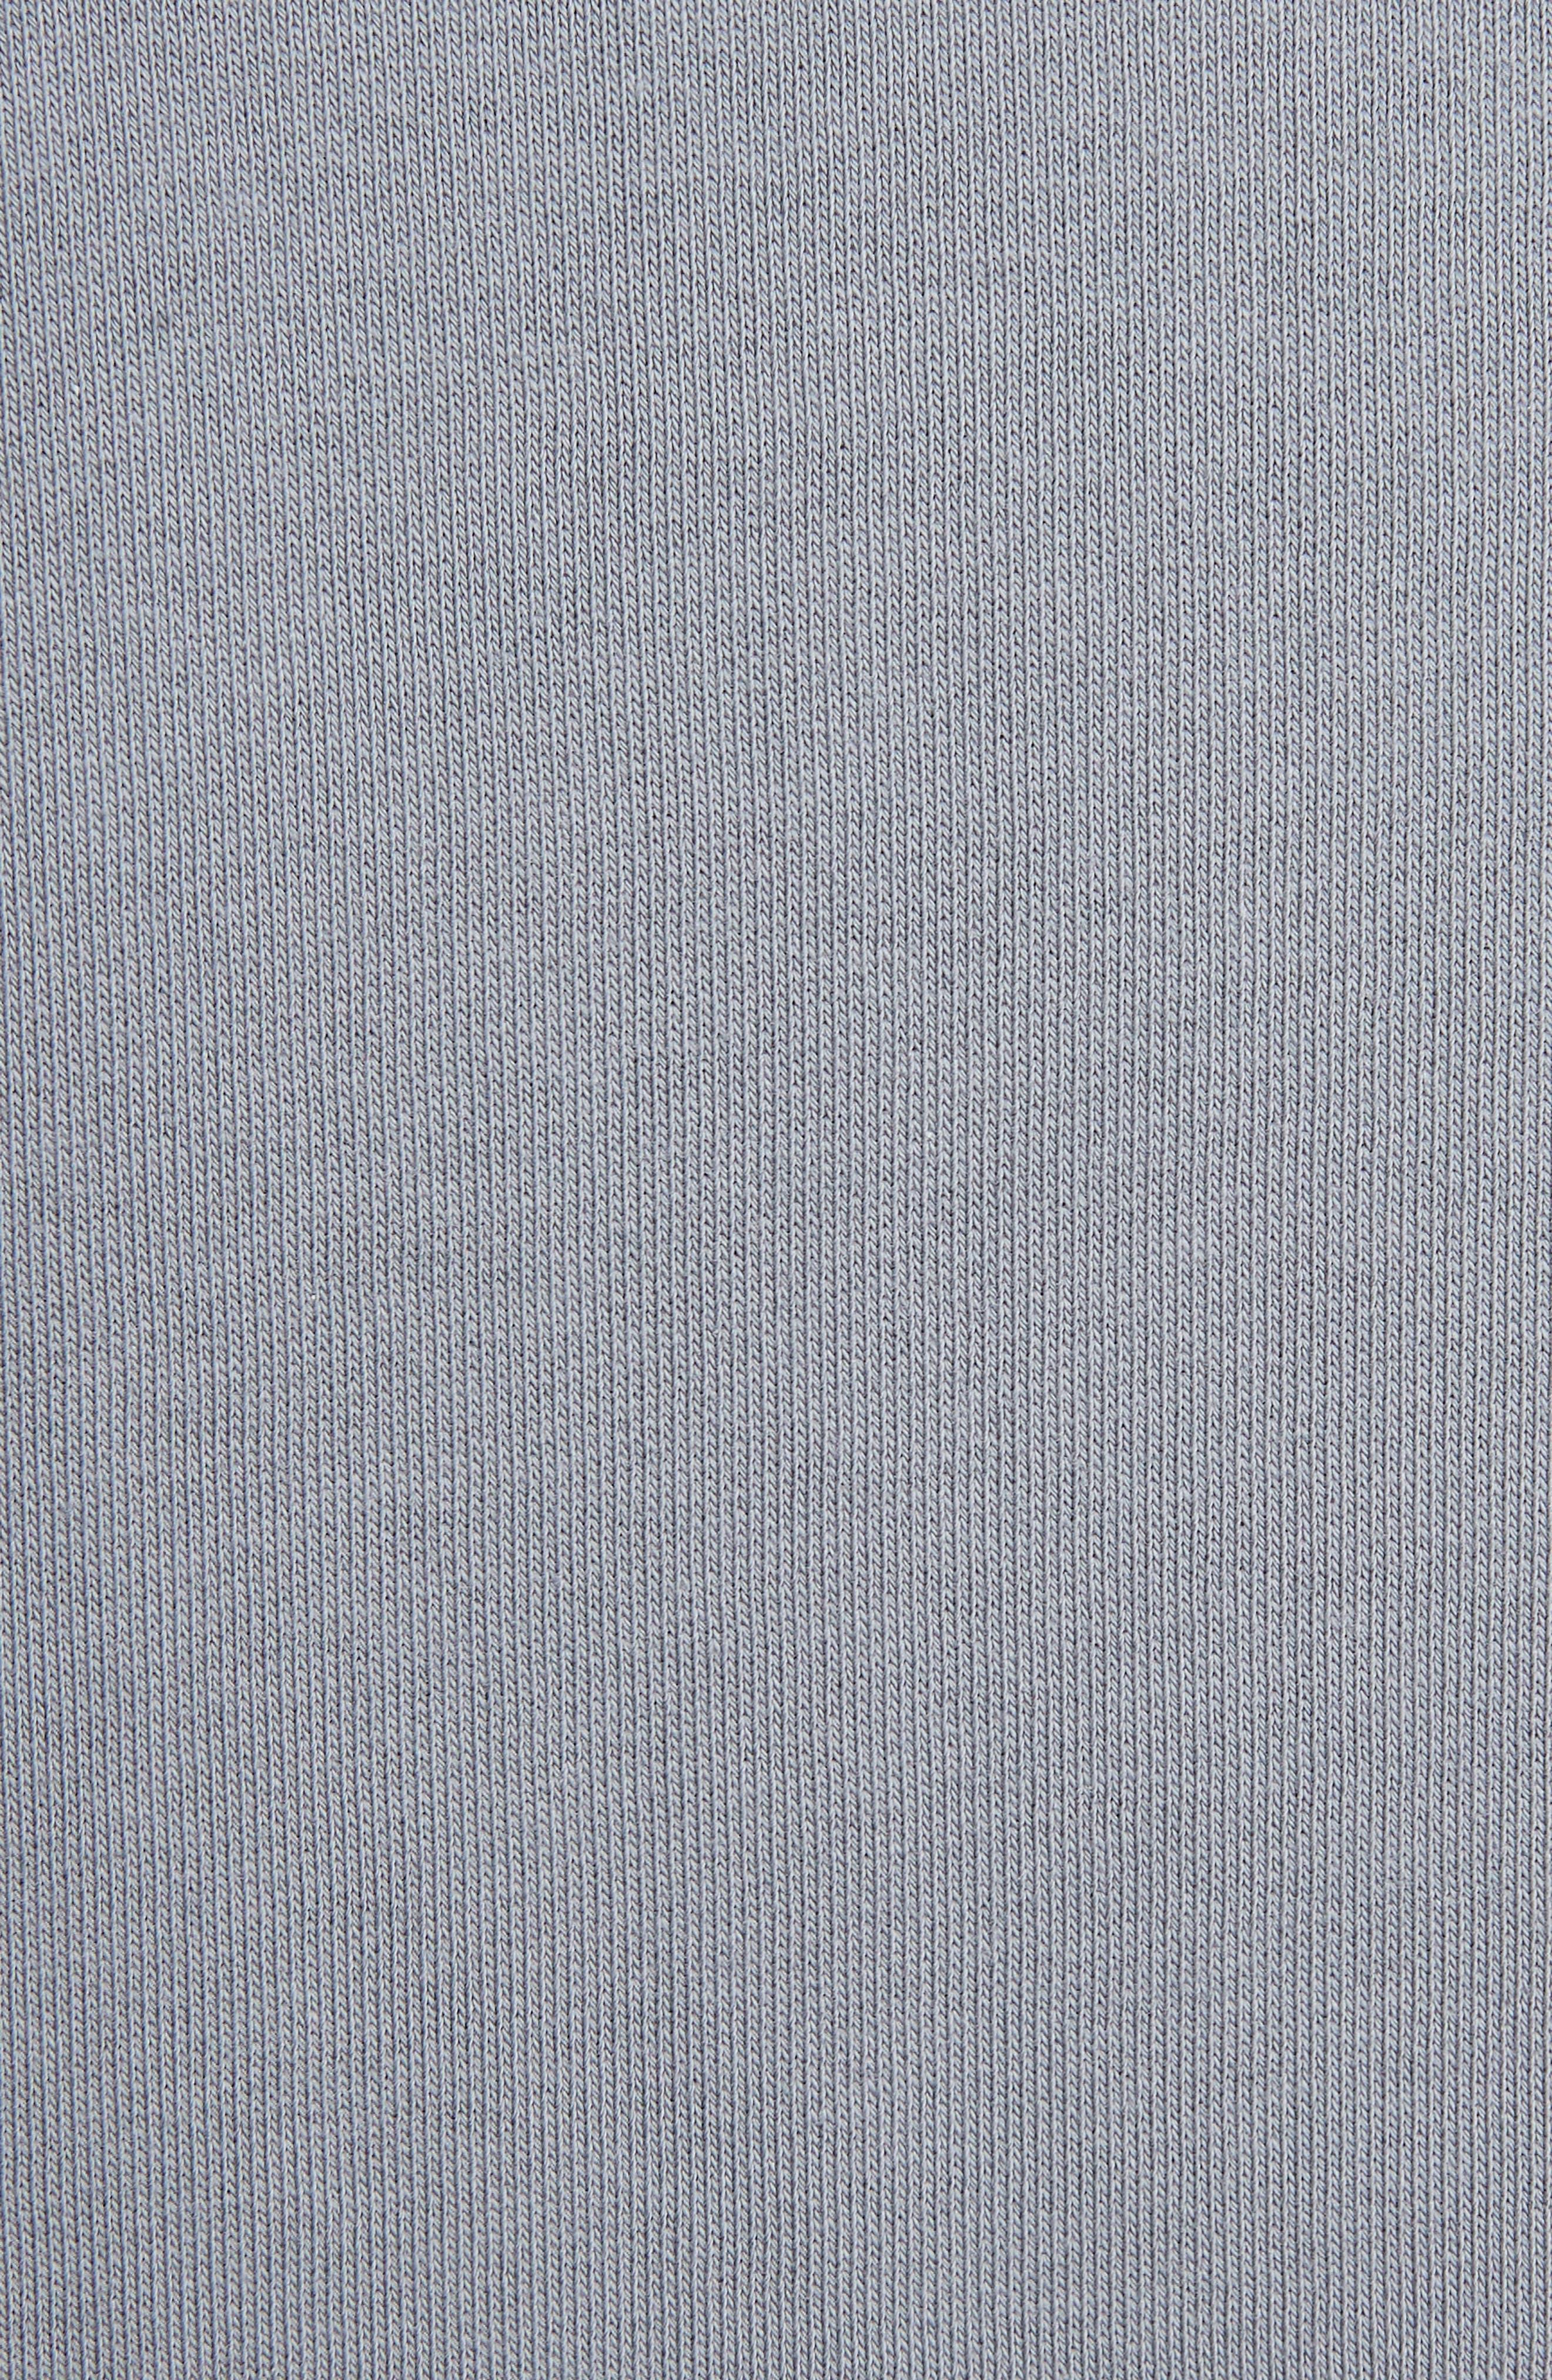 Sequin Embellished Sweatshirt,                             Alternate thumbnail 5, color,                             220